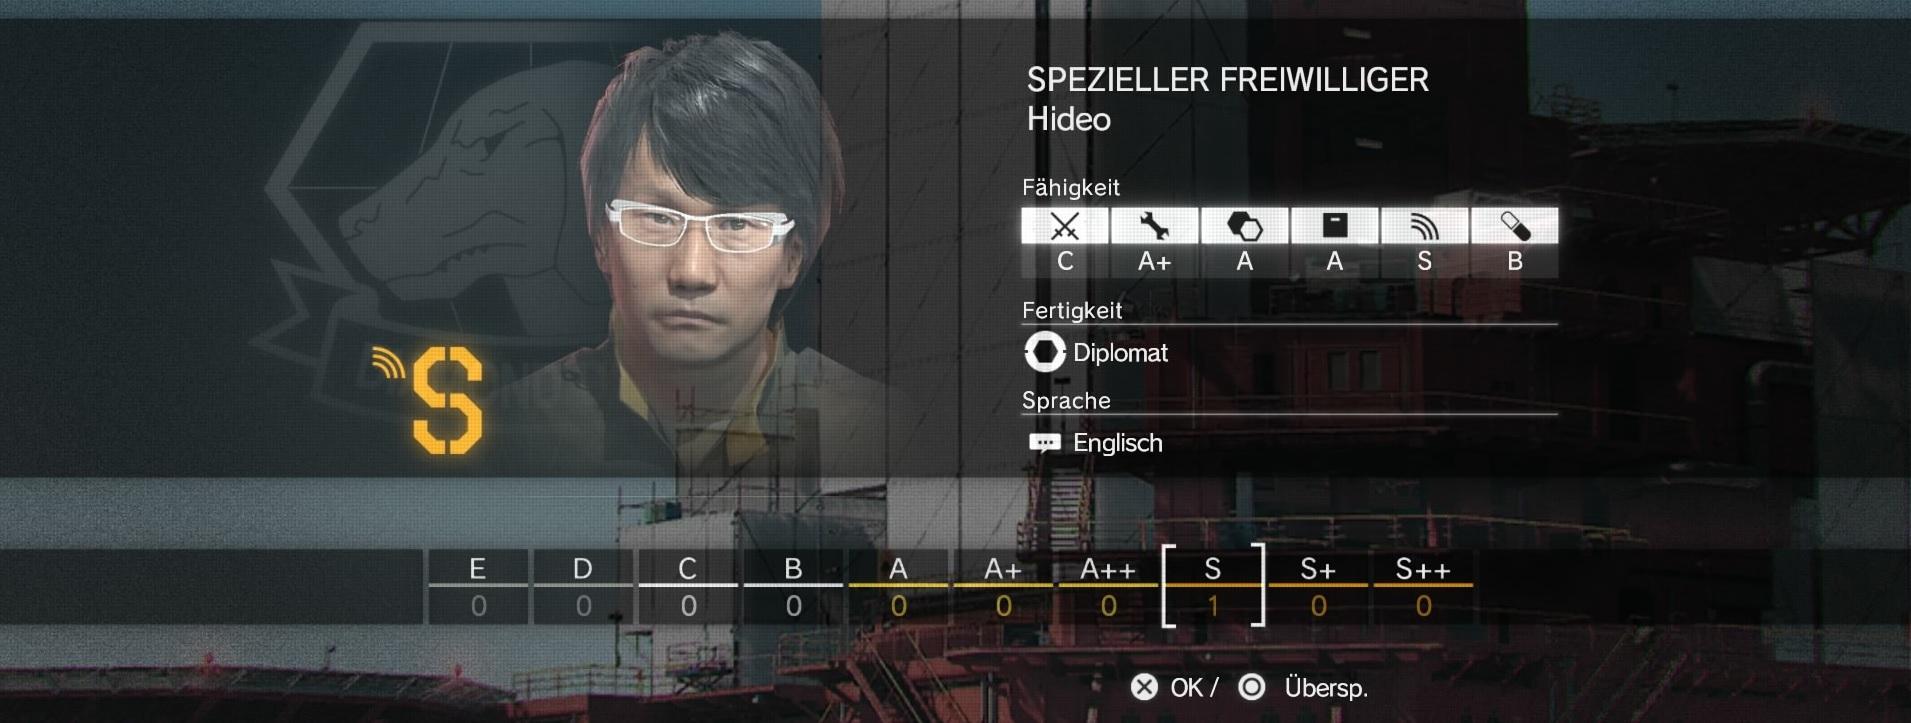 Mgs 5 The Phantom Pain Hideo Kojima Rekrutieren So Wird Er Zu